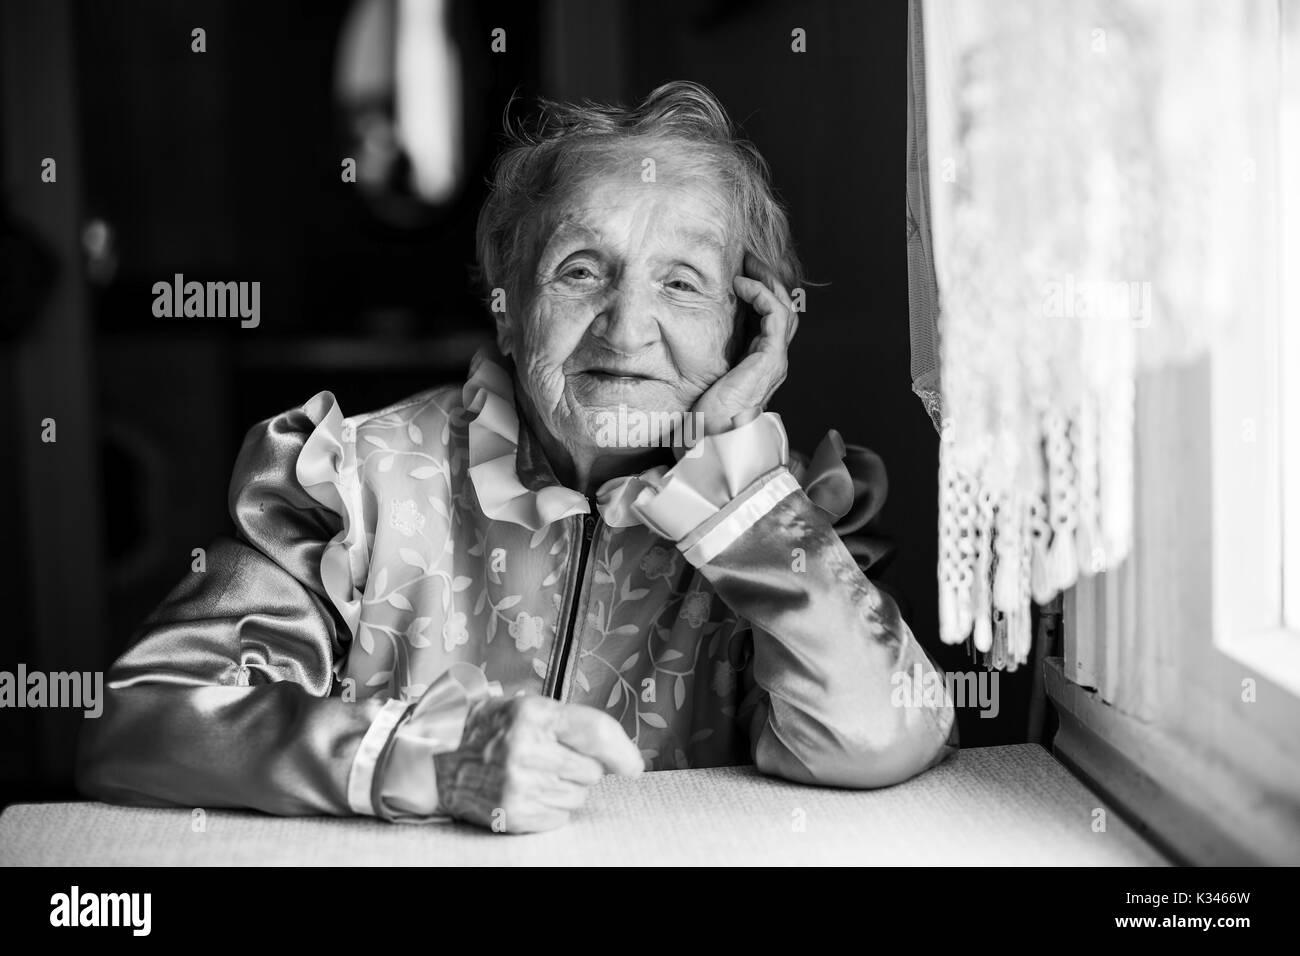 Slavic ethnic portrait of an elderly woman. Black and white photo. - Stock Image